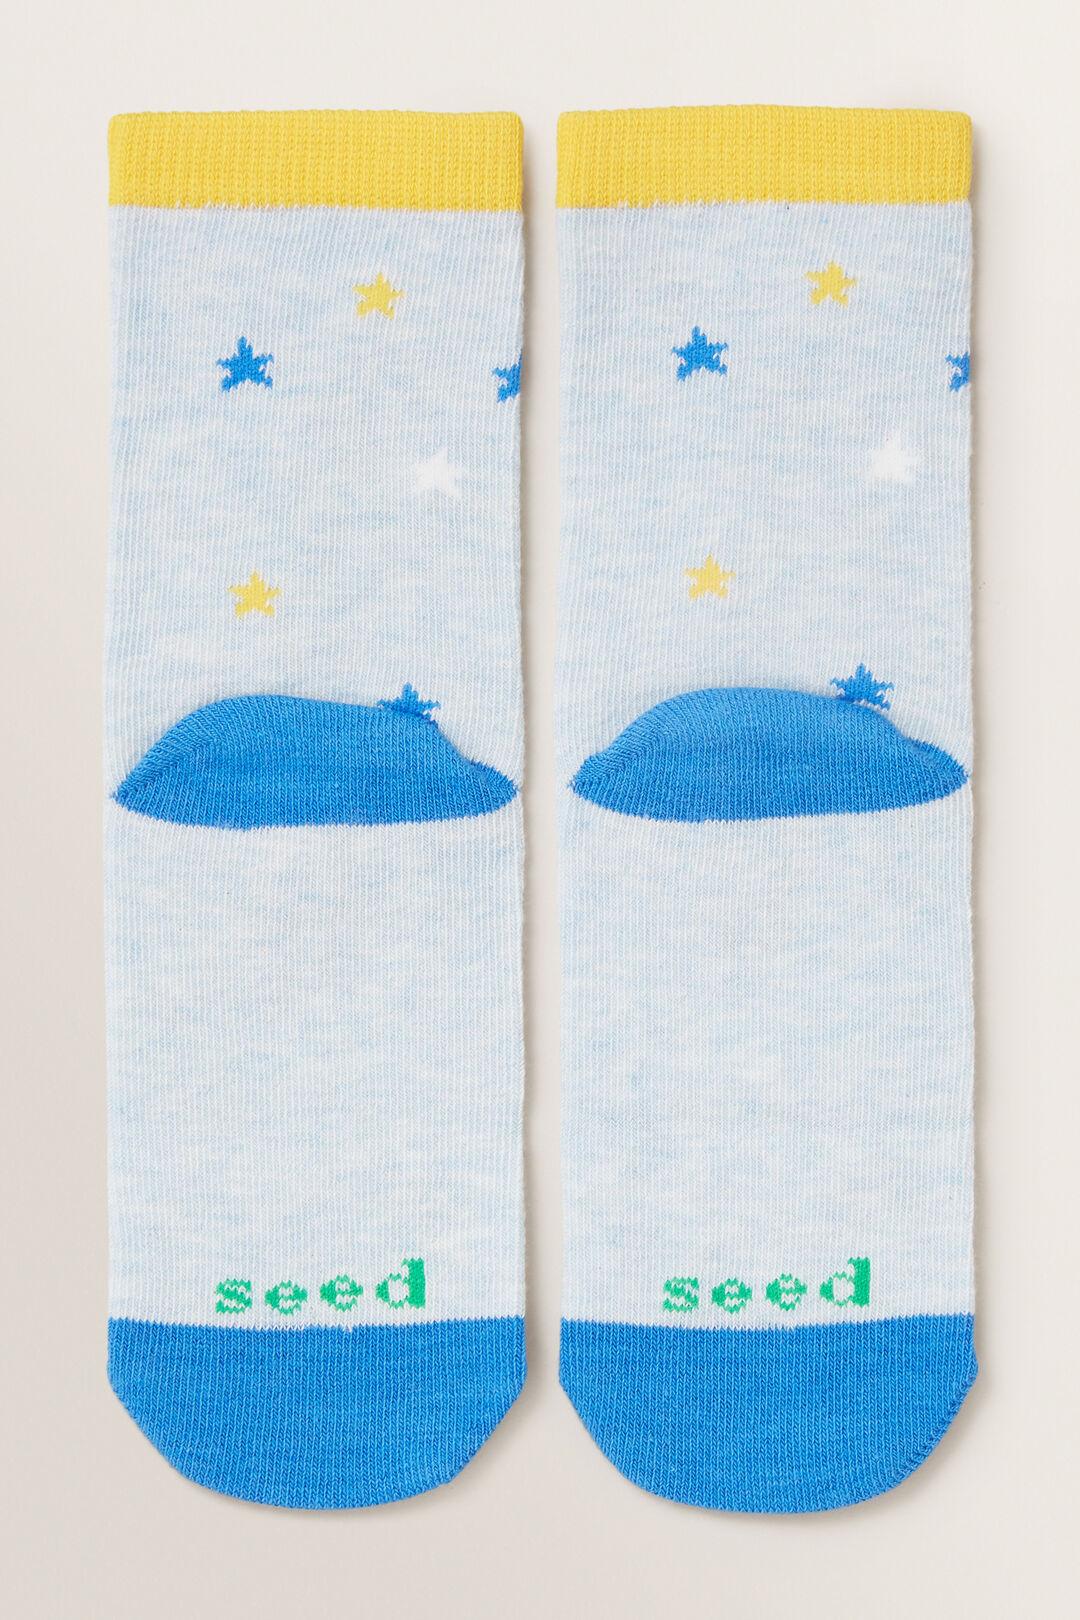 Rocket Socks  MULTI  hi-res